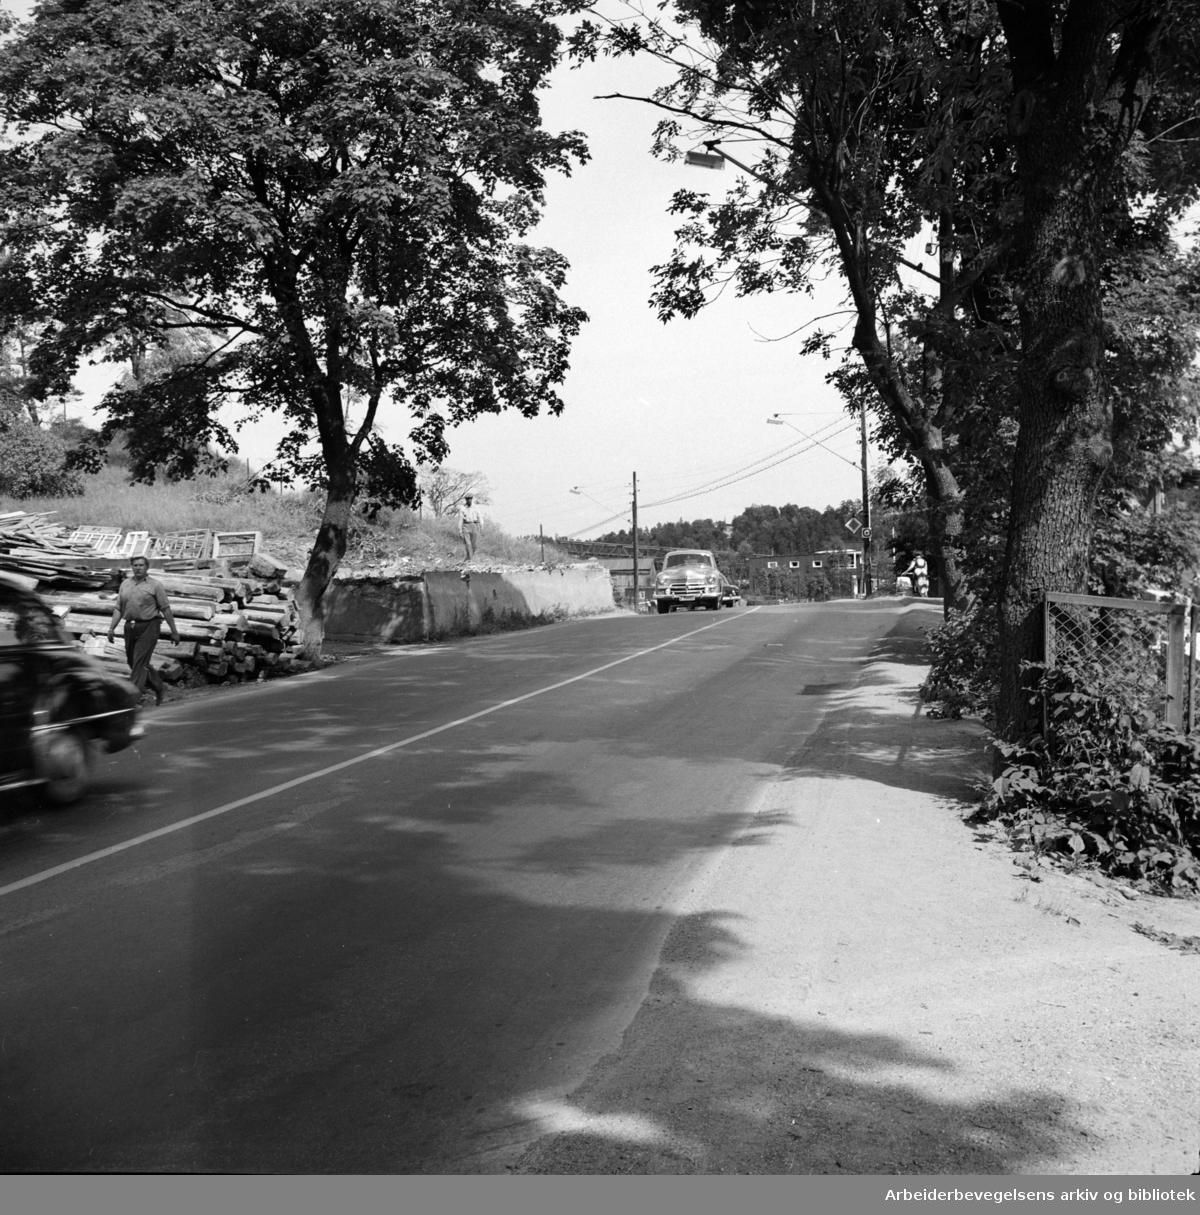 Drammensveien, diverse. Drammensveien blir bedre og bedre. Juli 1955